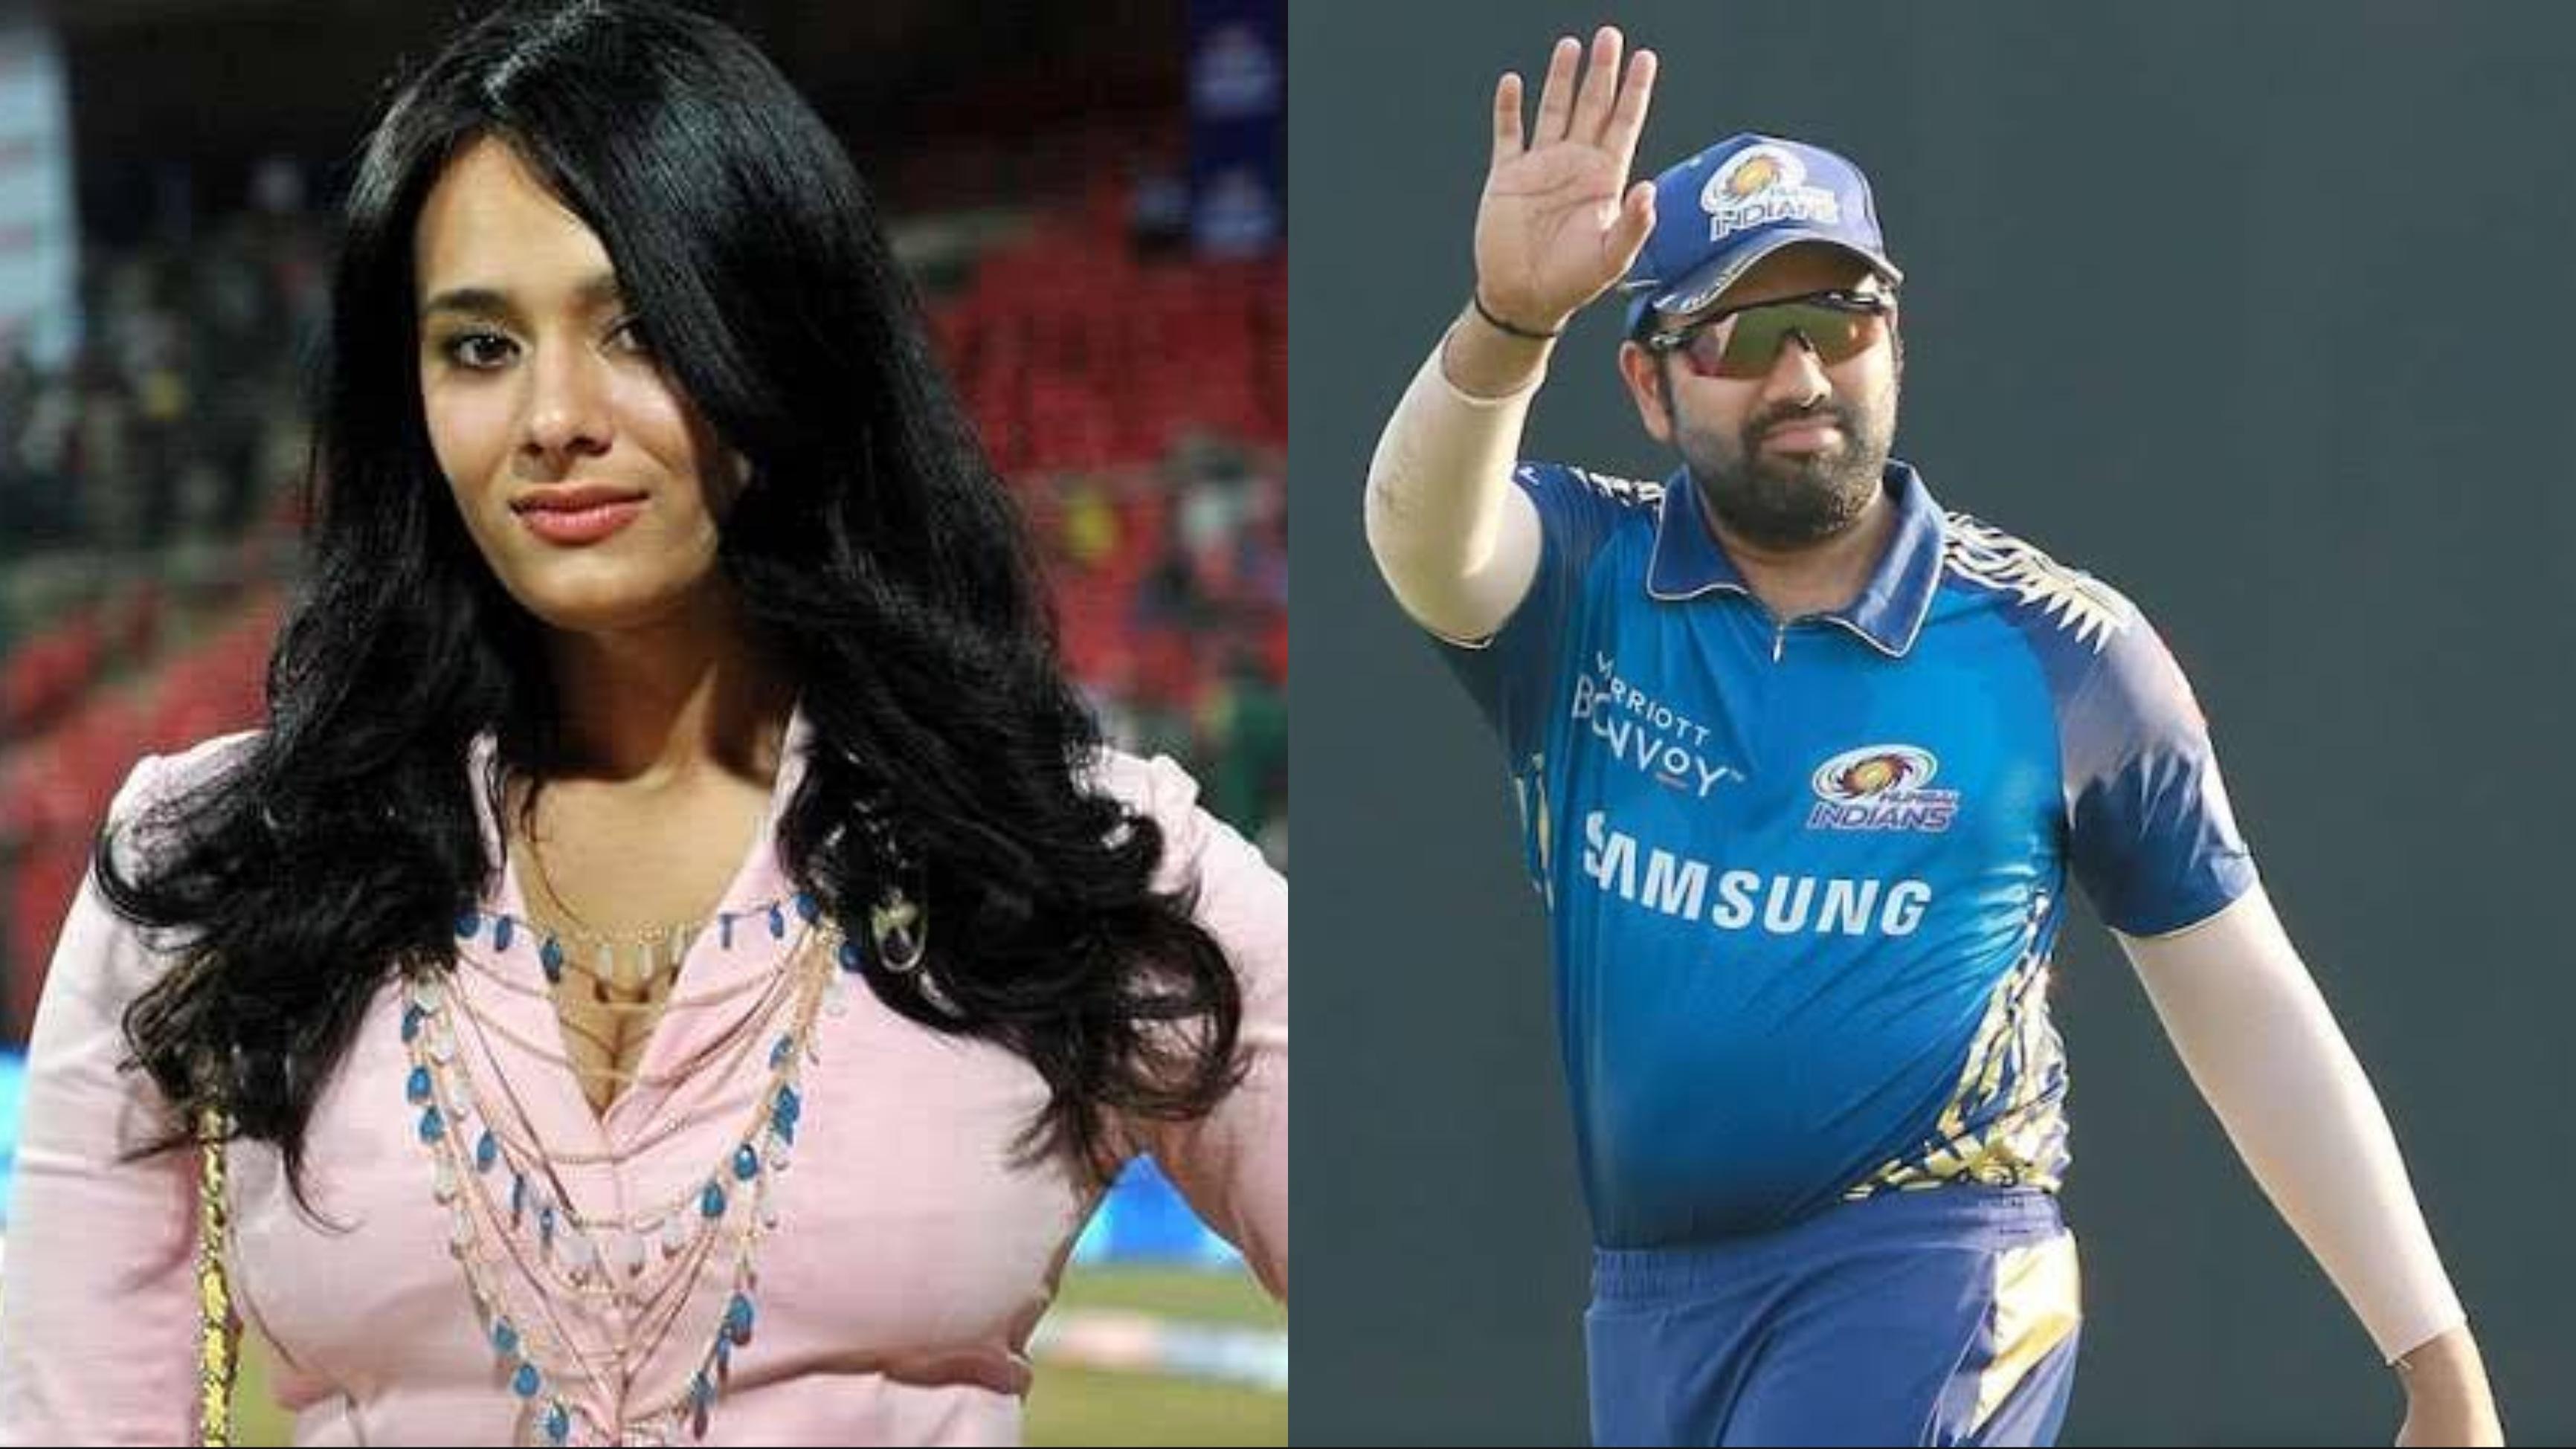 Here's how Mayanti Langer will honor Rohit Sharma if MI score 200 runs against KKR